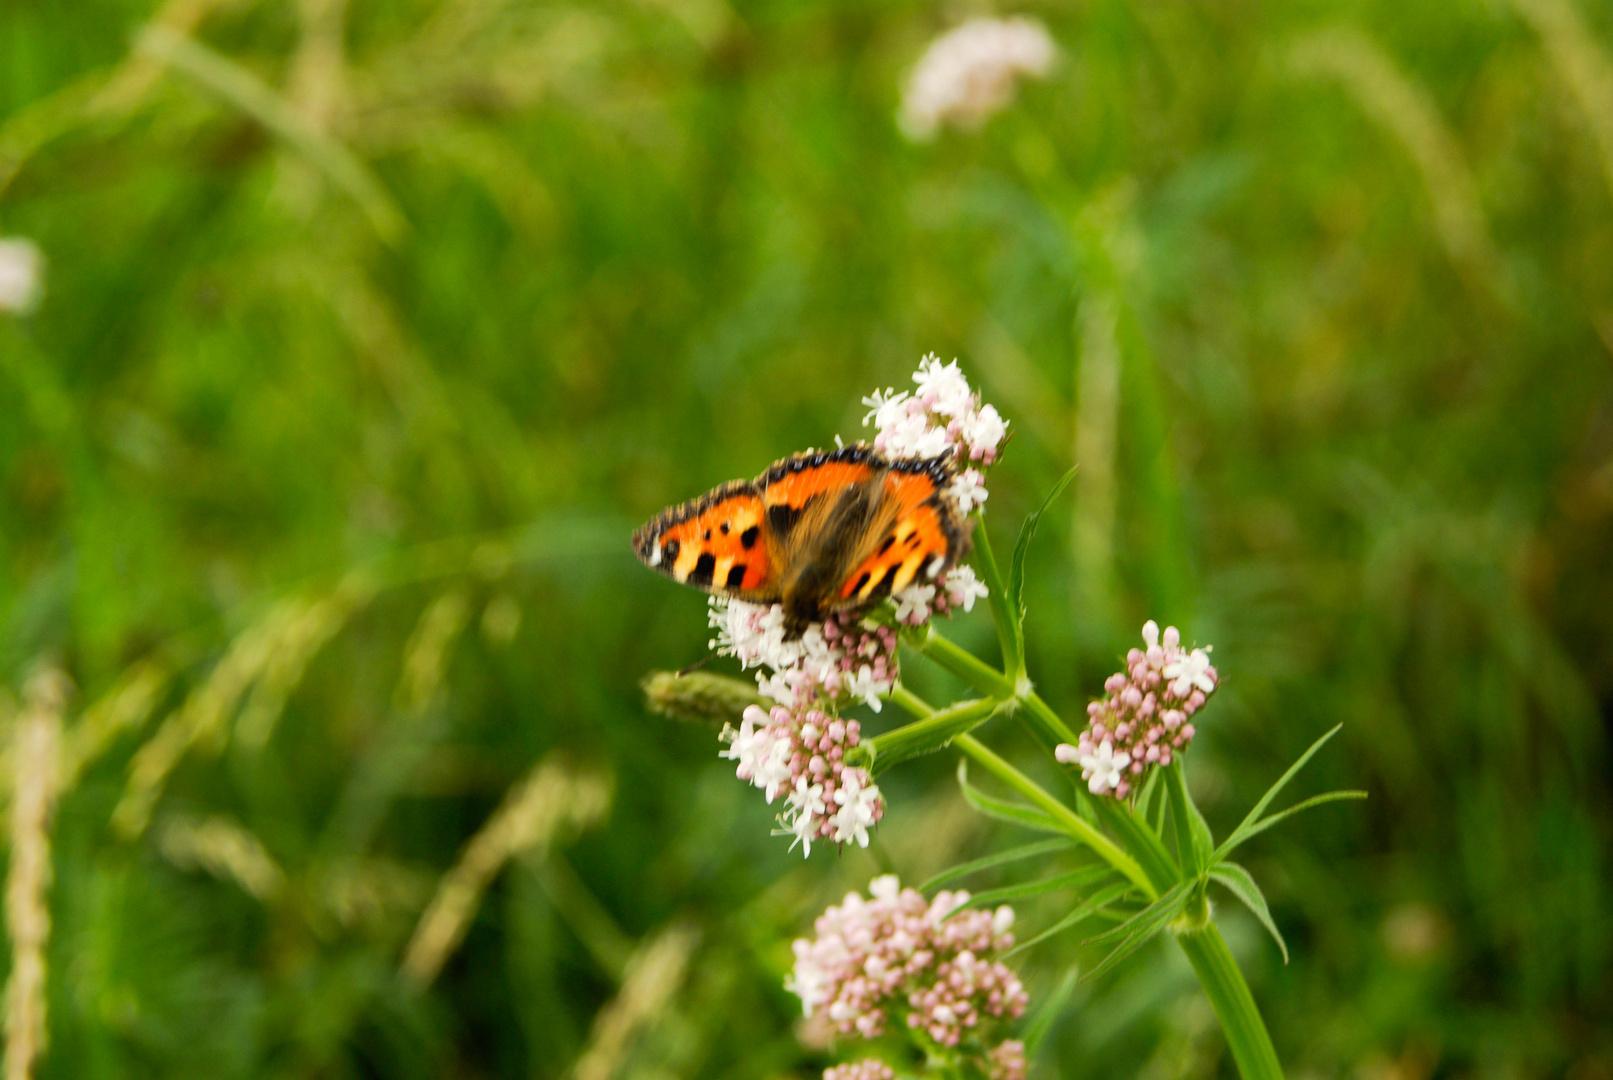 Farbenfroher Schmetterling